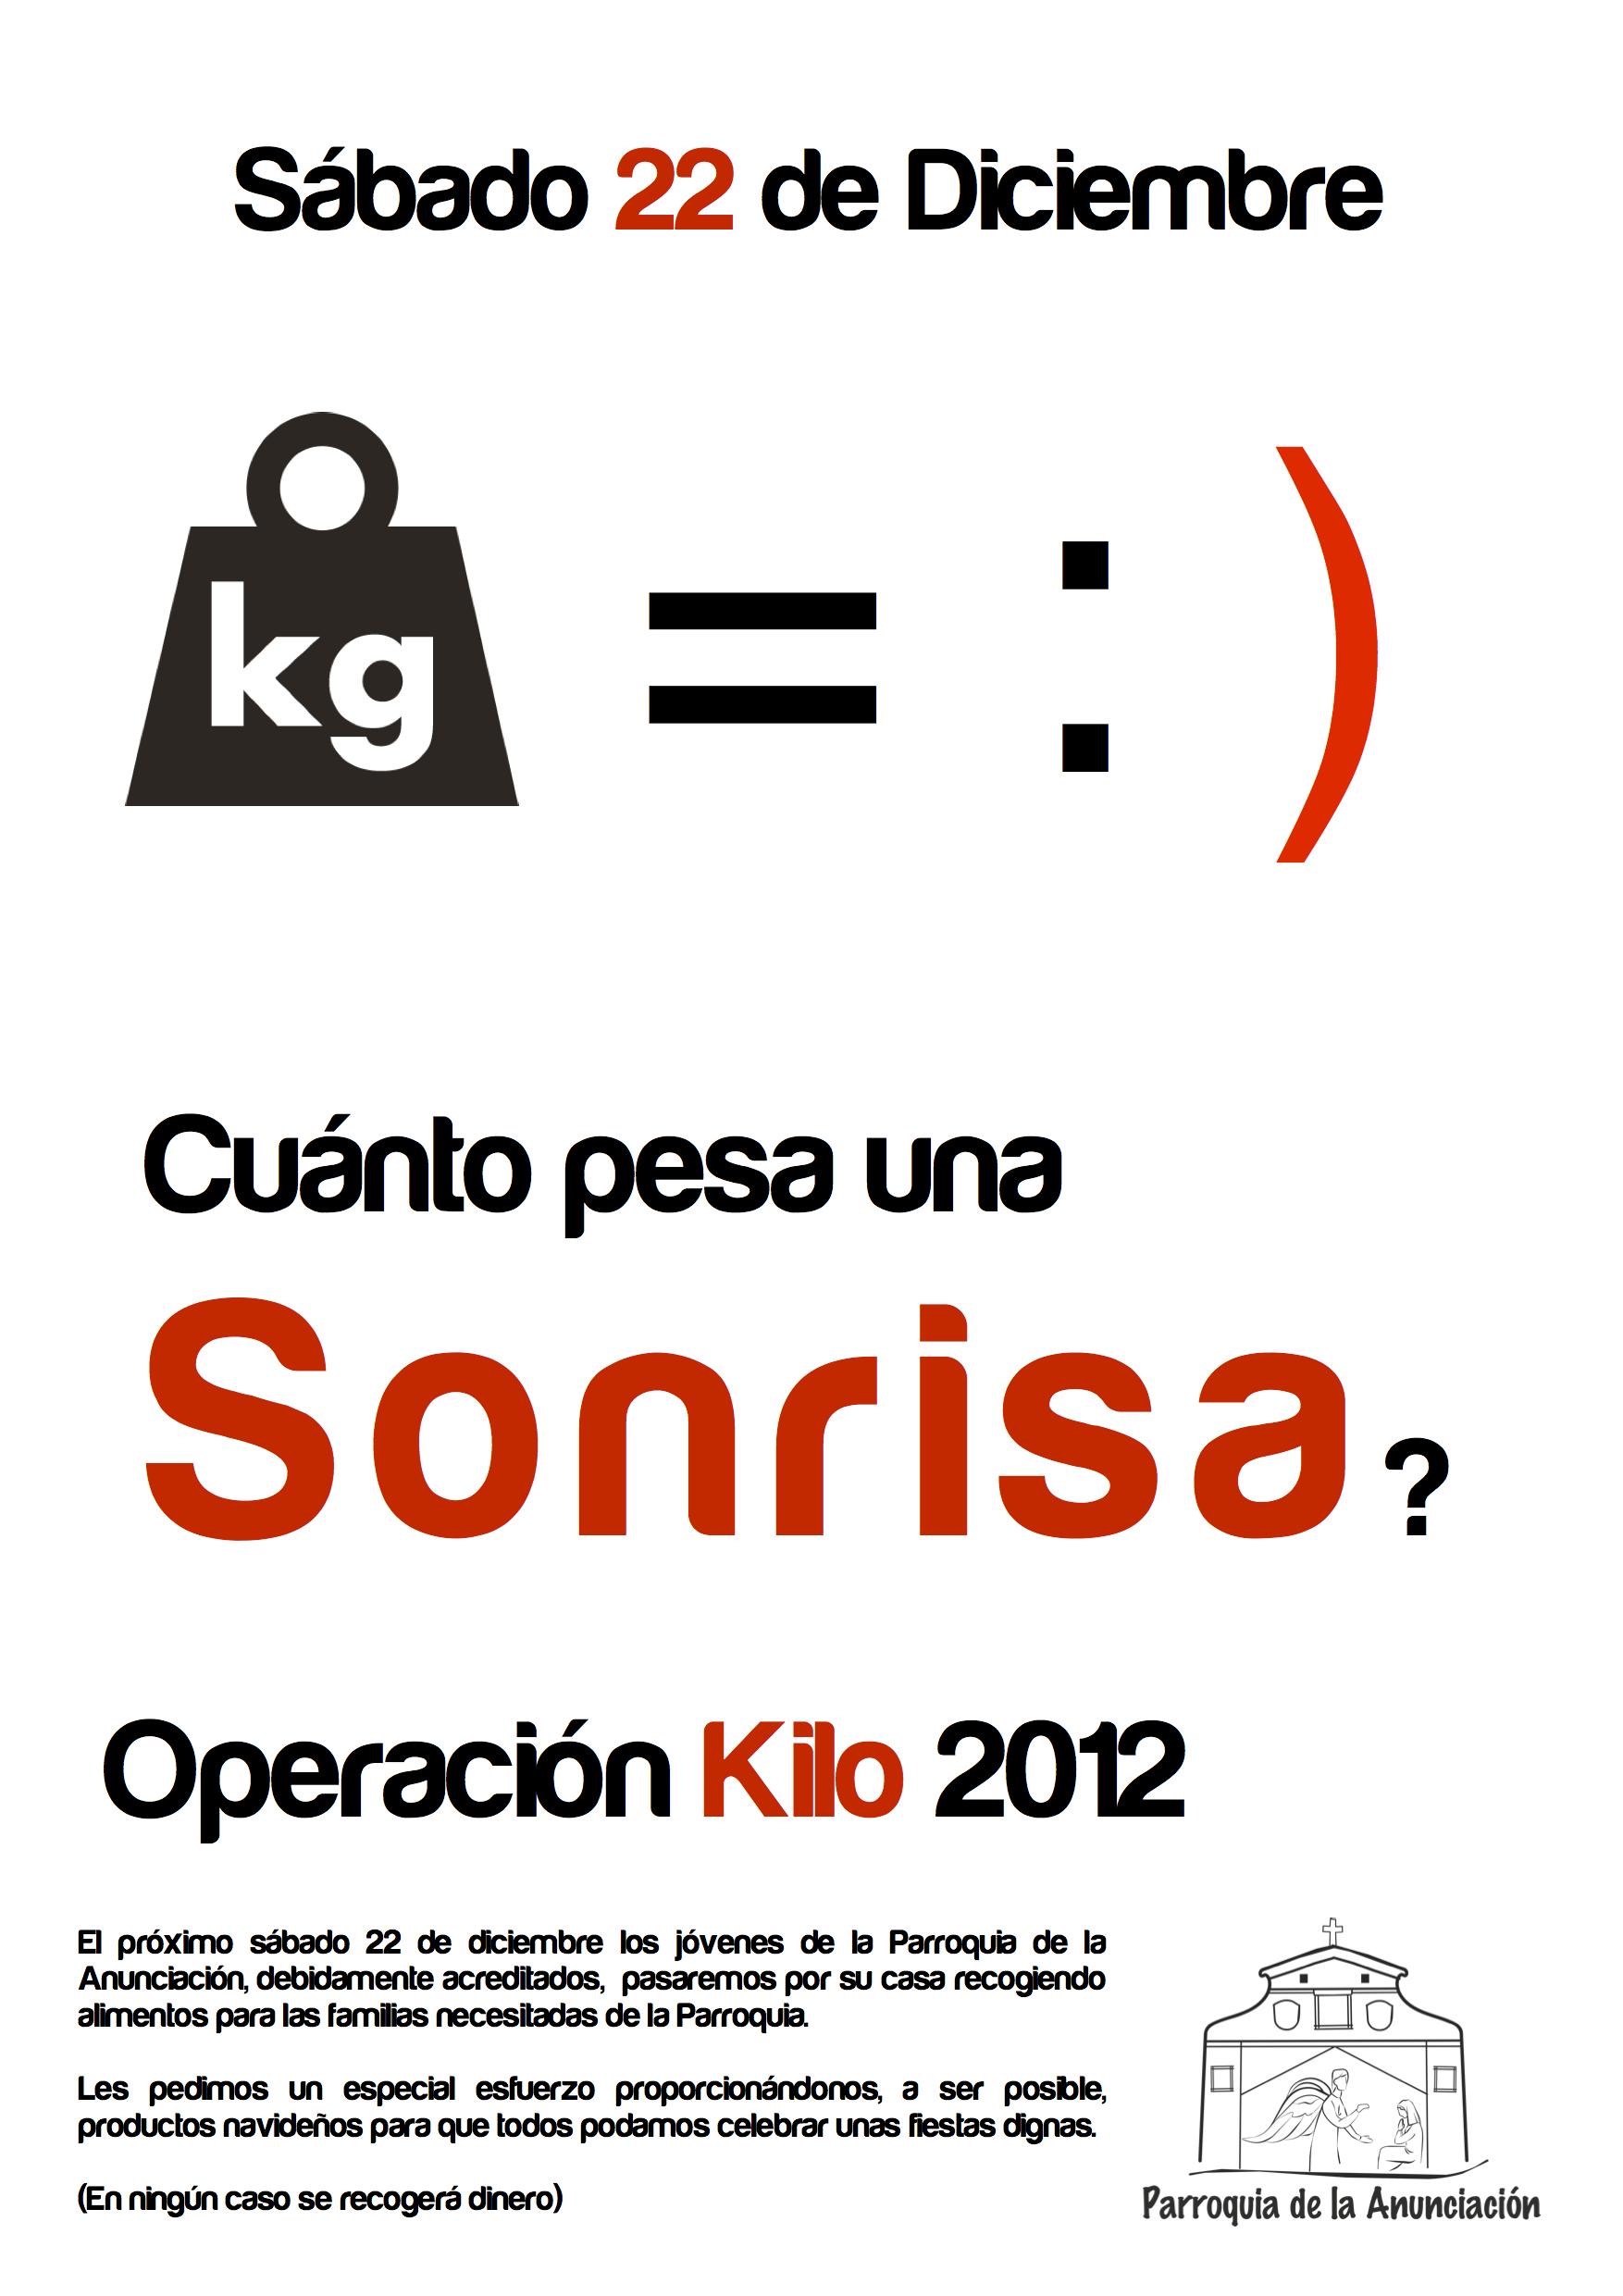 Operación Kilo 2012